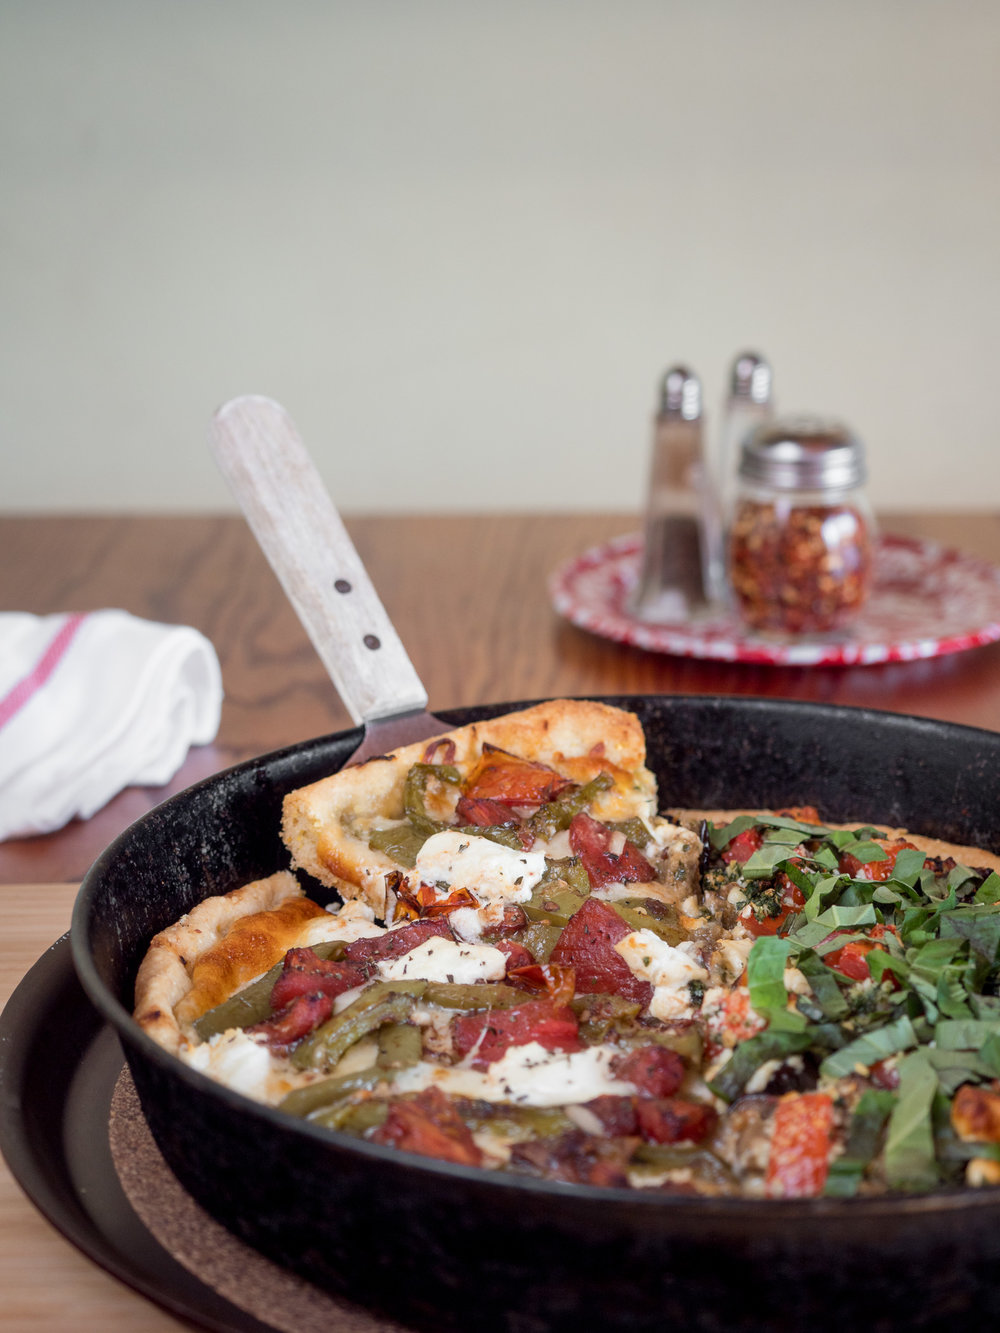 dove vivi pizza picture portland pacific northwest food photography photographer-2.jpg